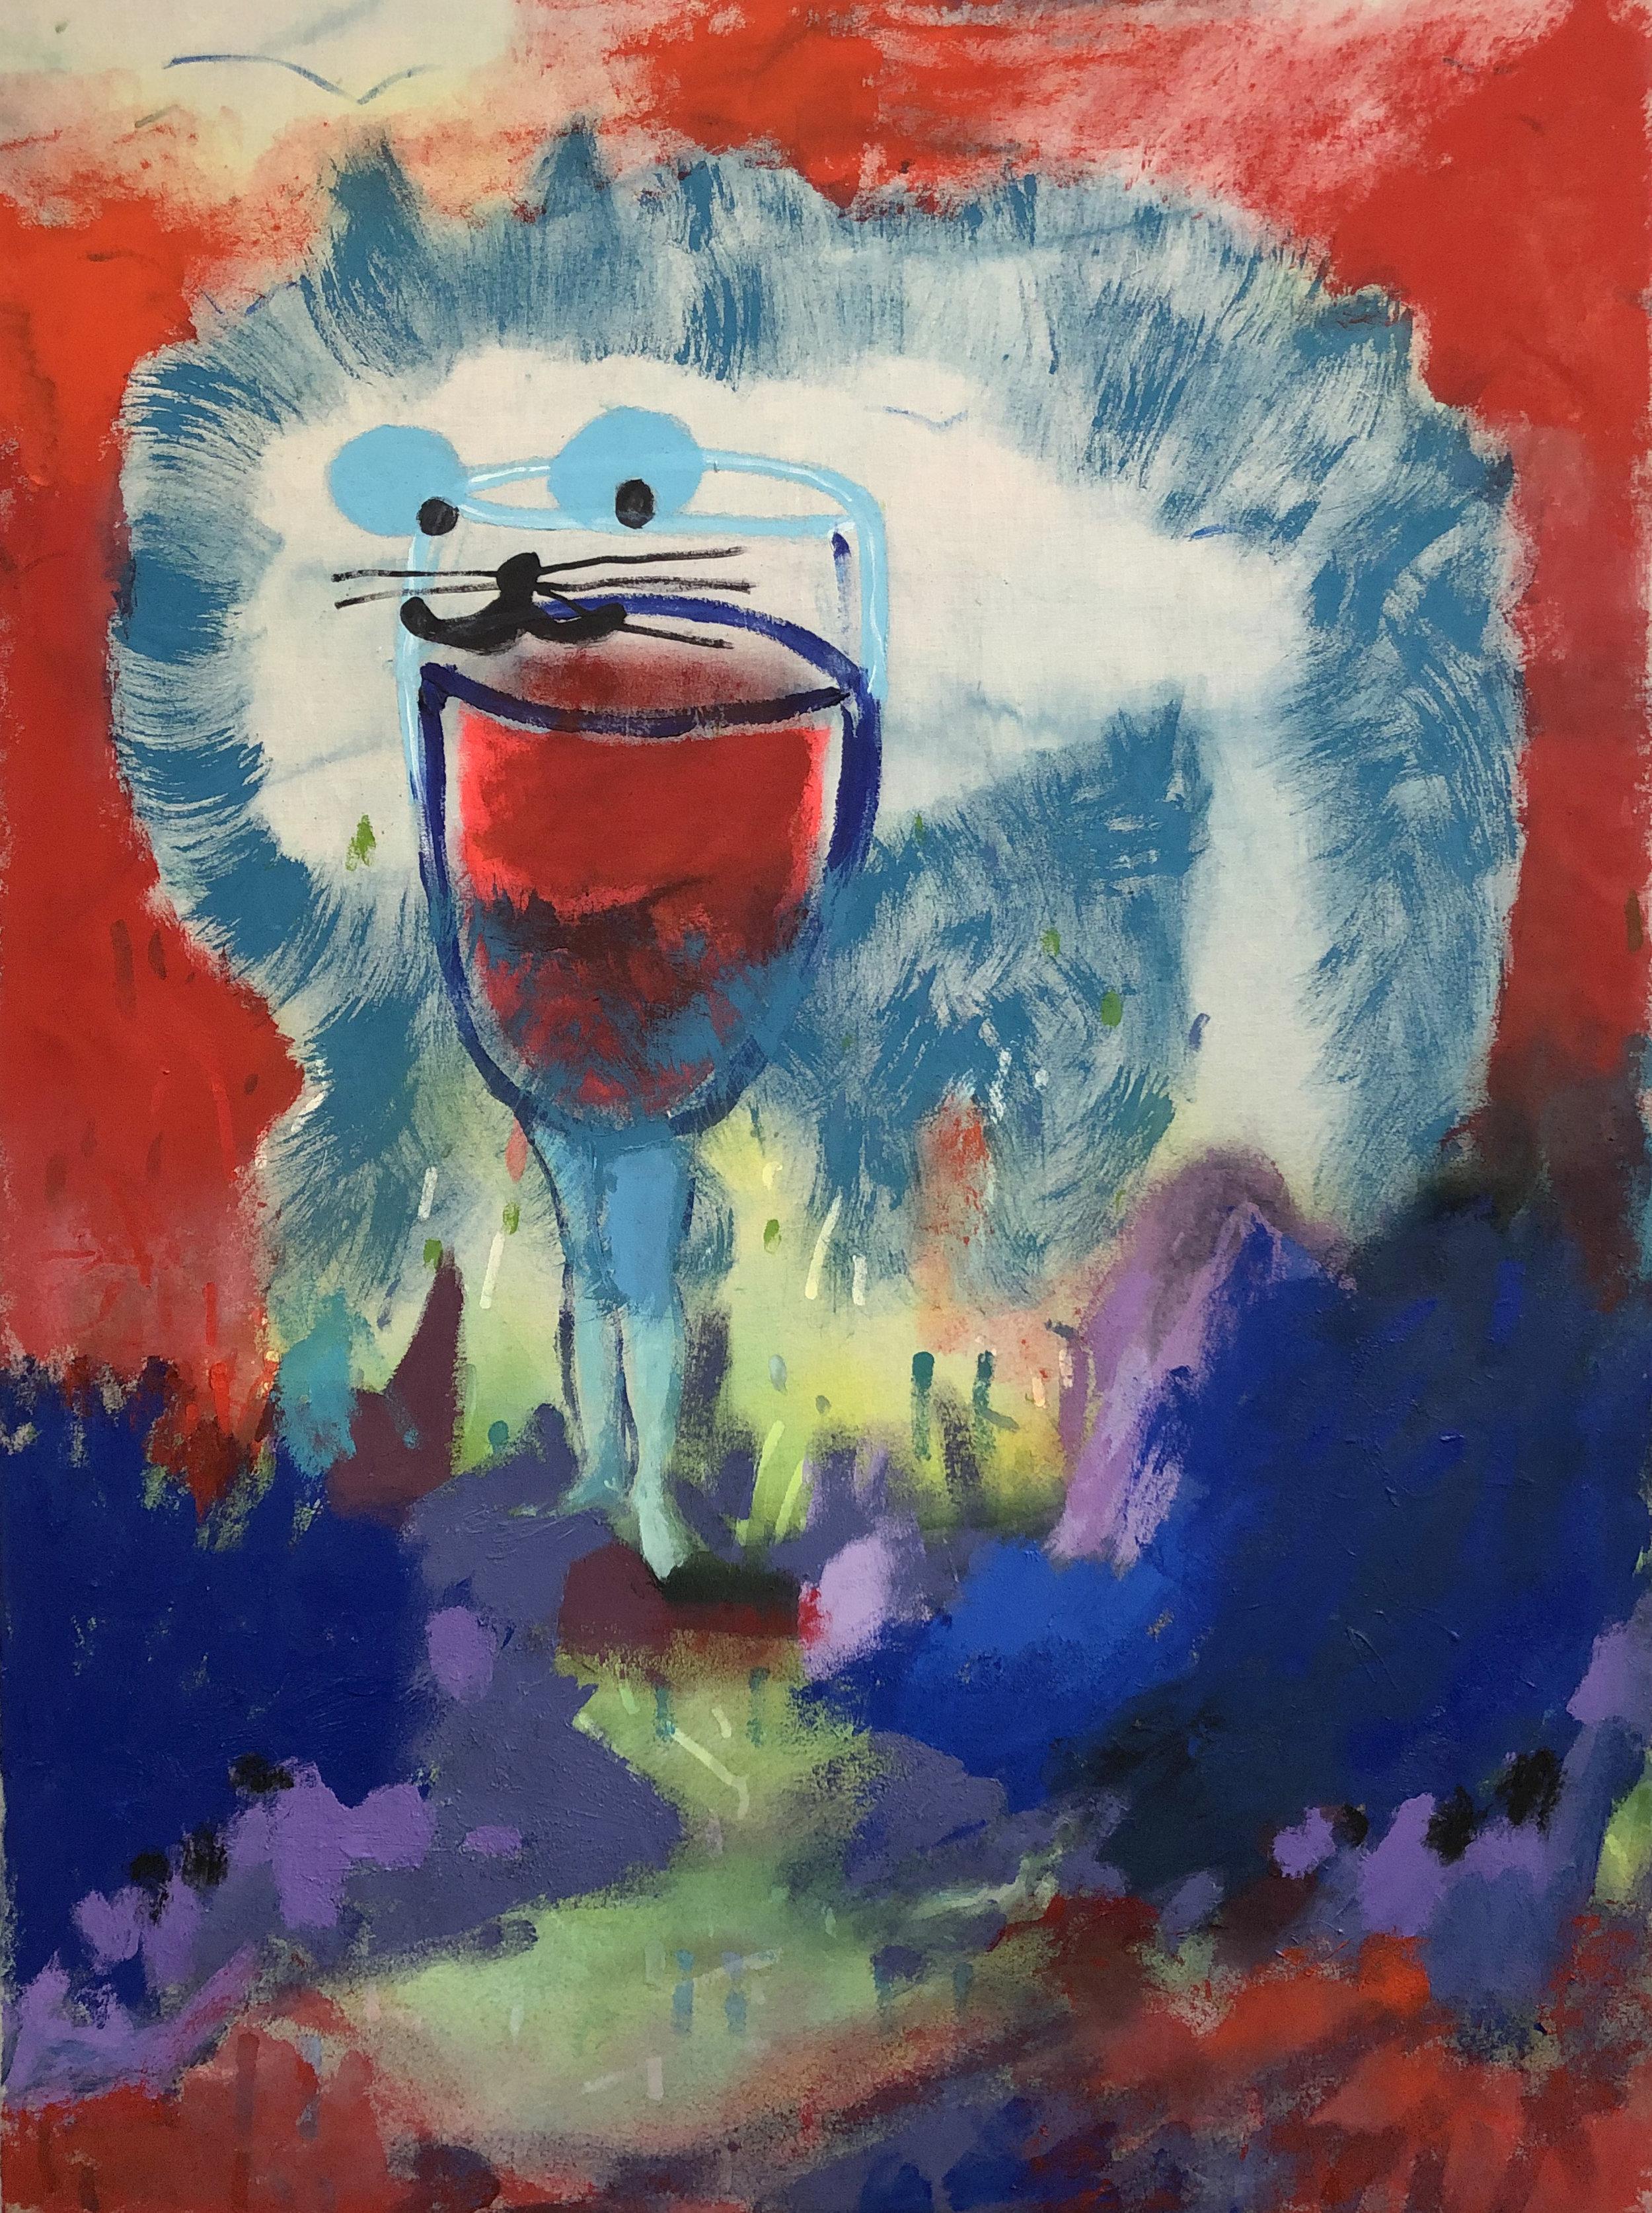 07_Joshua Petker, 36x24%22, acrylic and oil on canvas, 2018.jpg